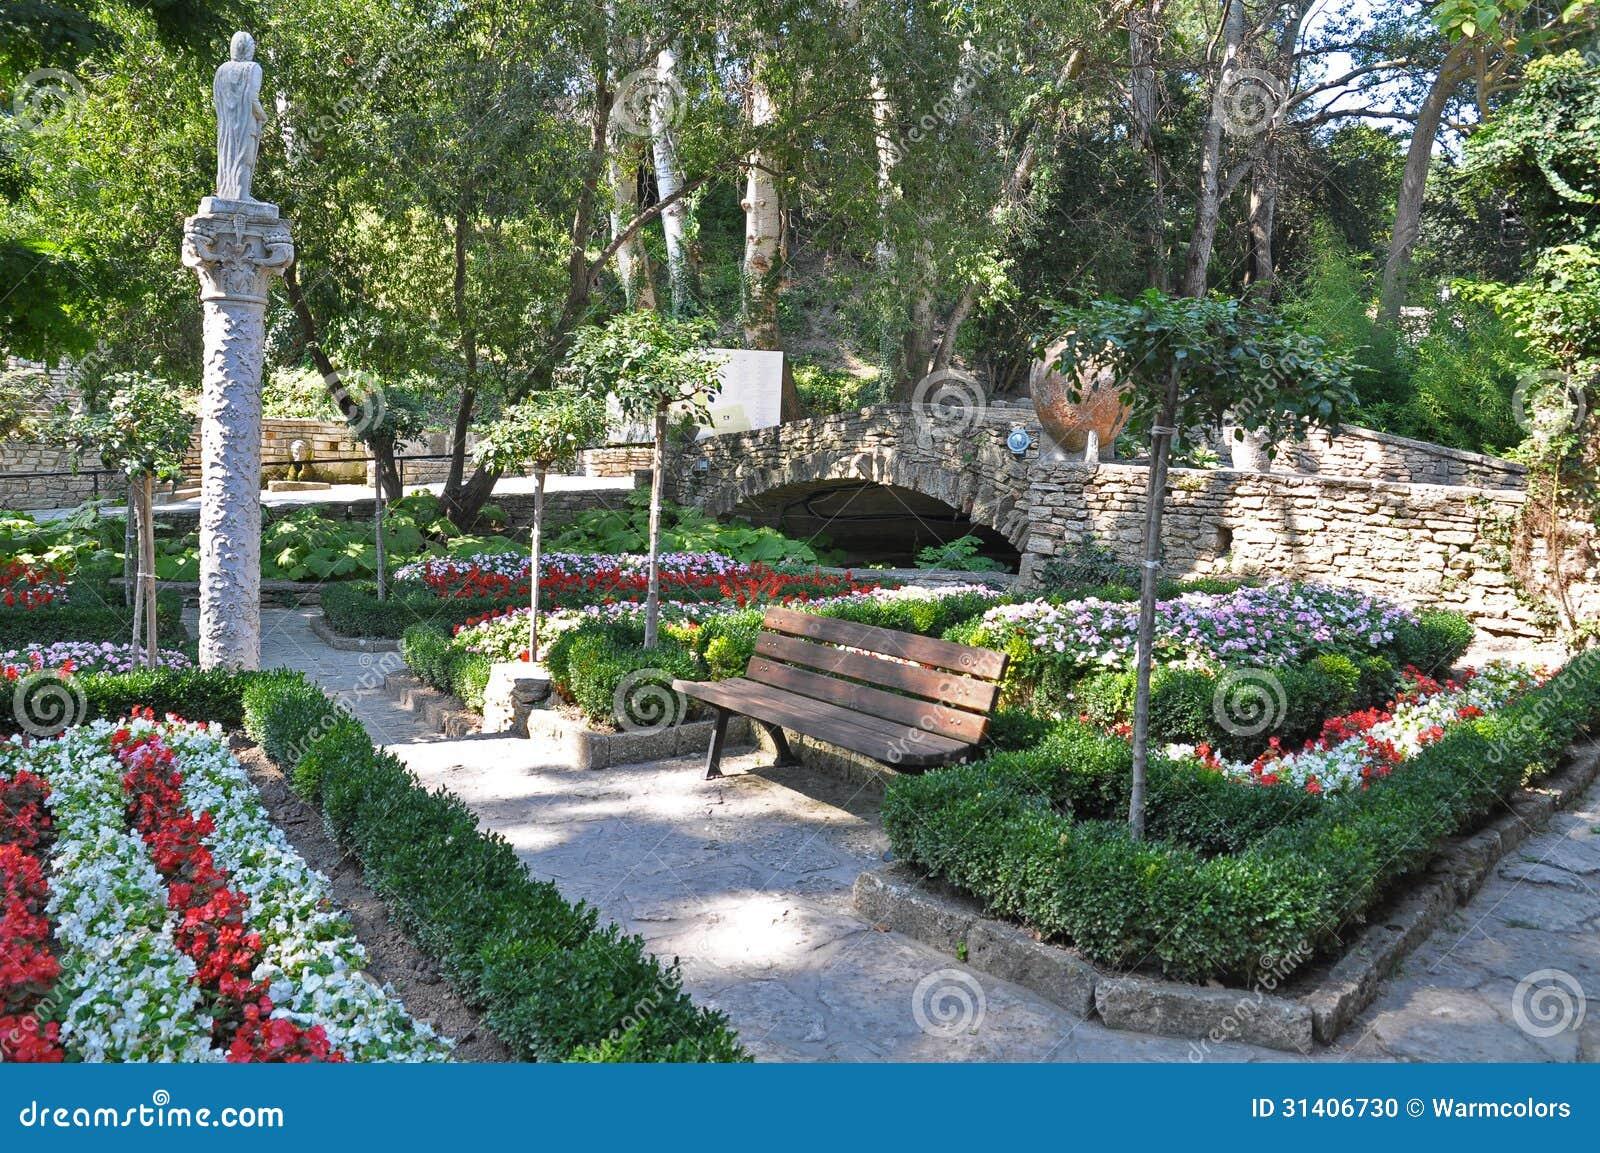 Zilker Botanical Garden starts Phase I of its Master Planning Process